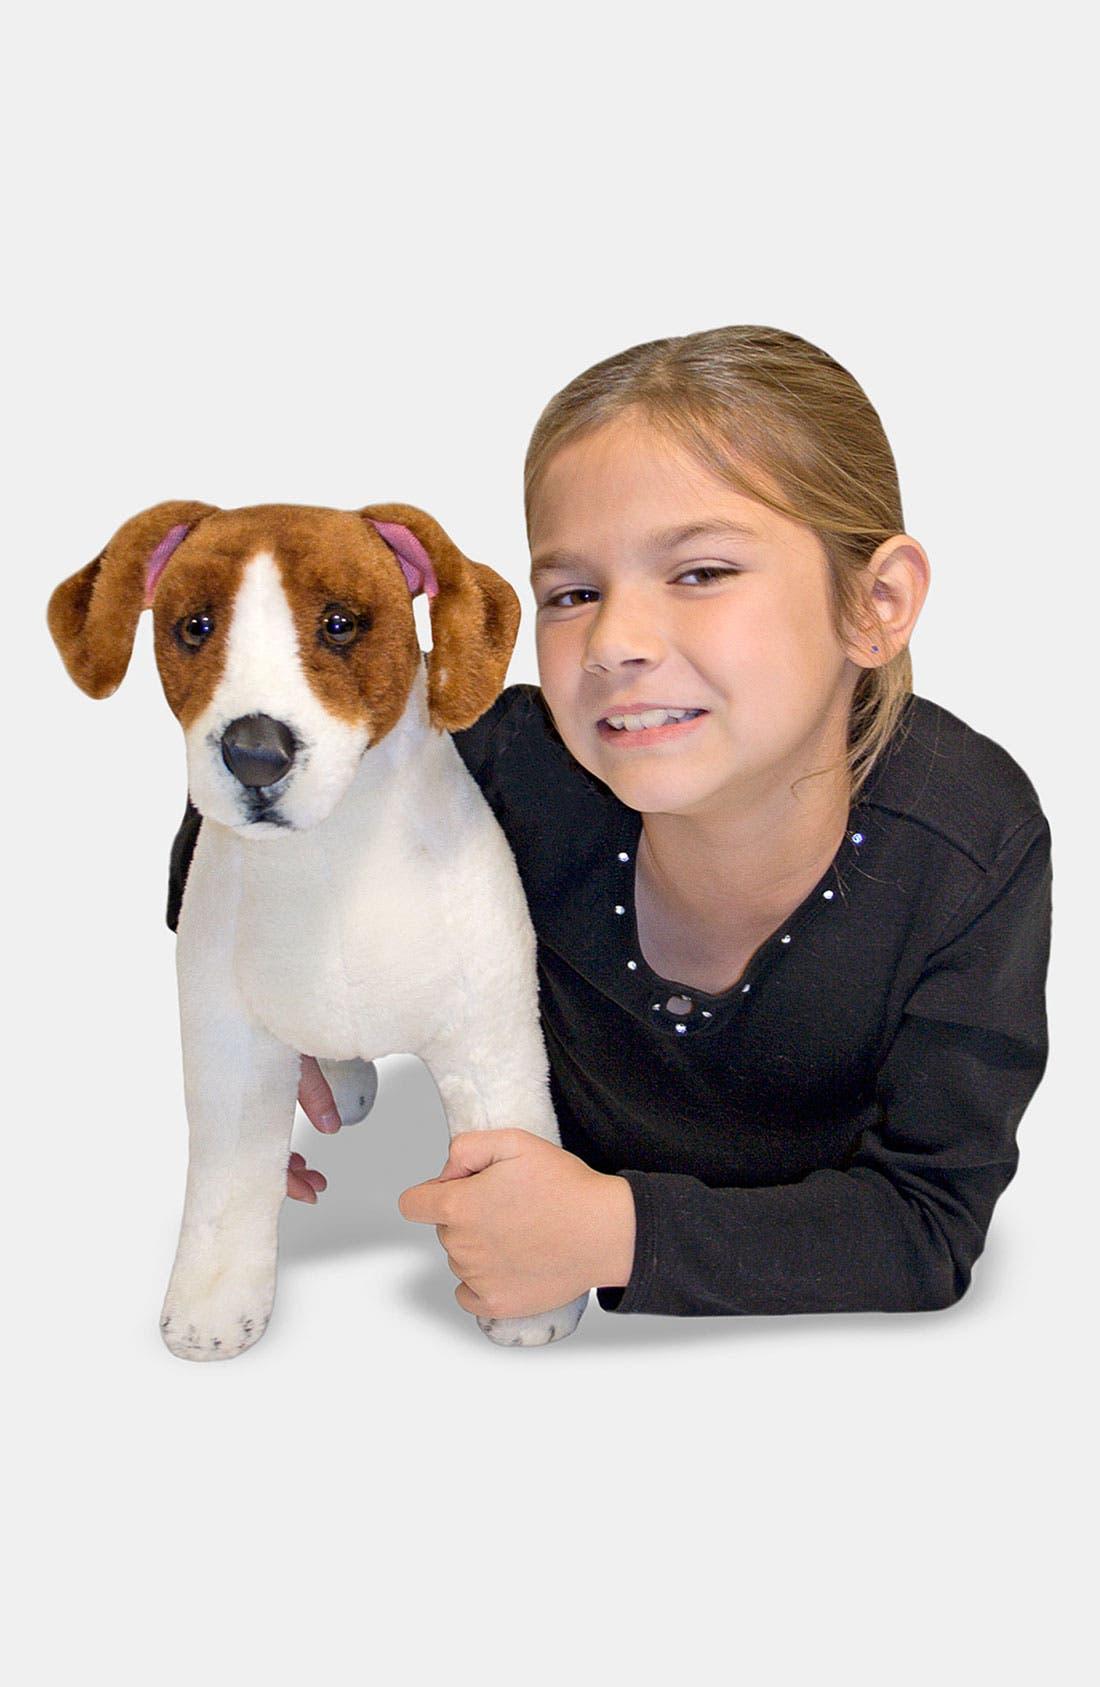 Alternate Image 1 Selected - Melissa & Doug Oversized Jack Russell Terrier